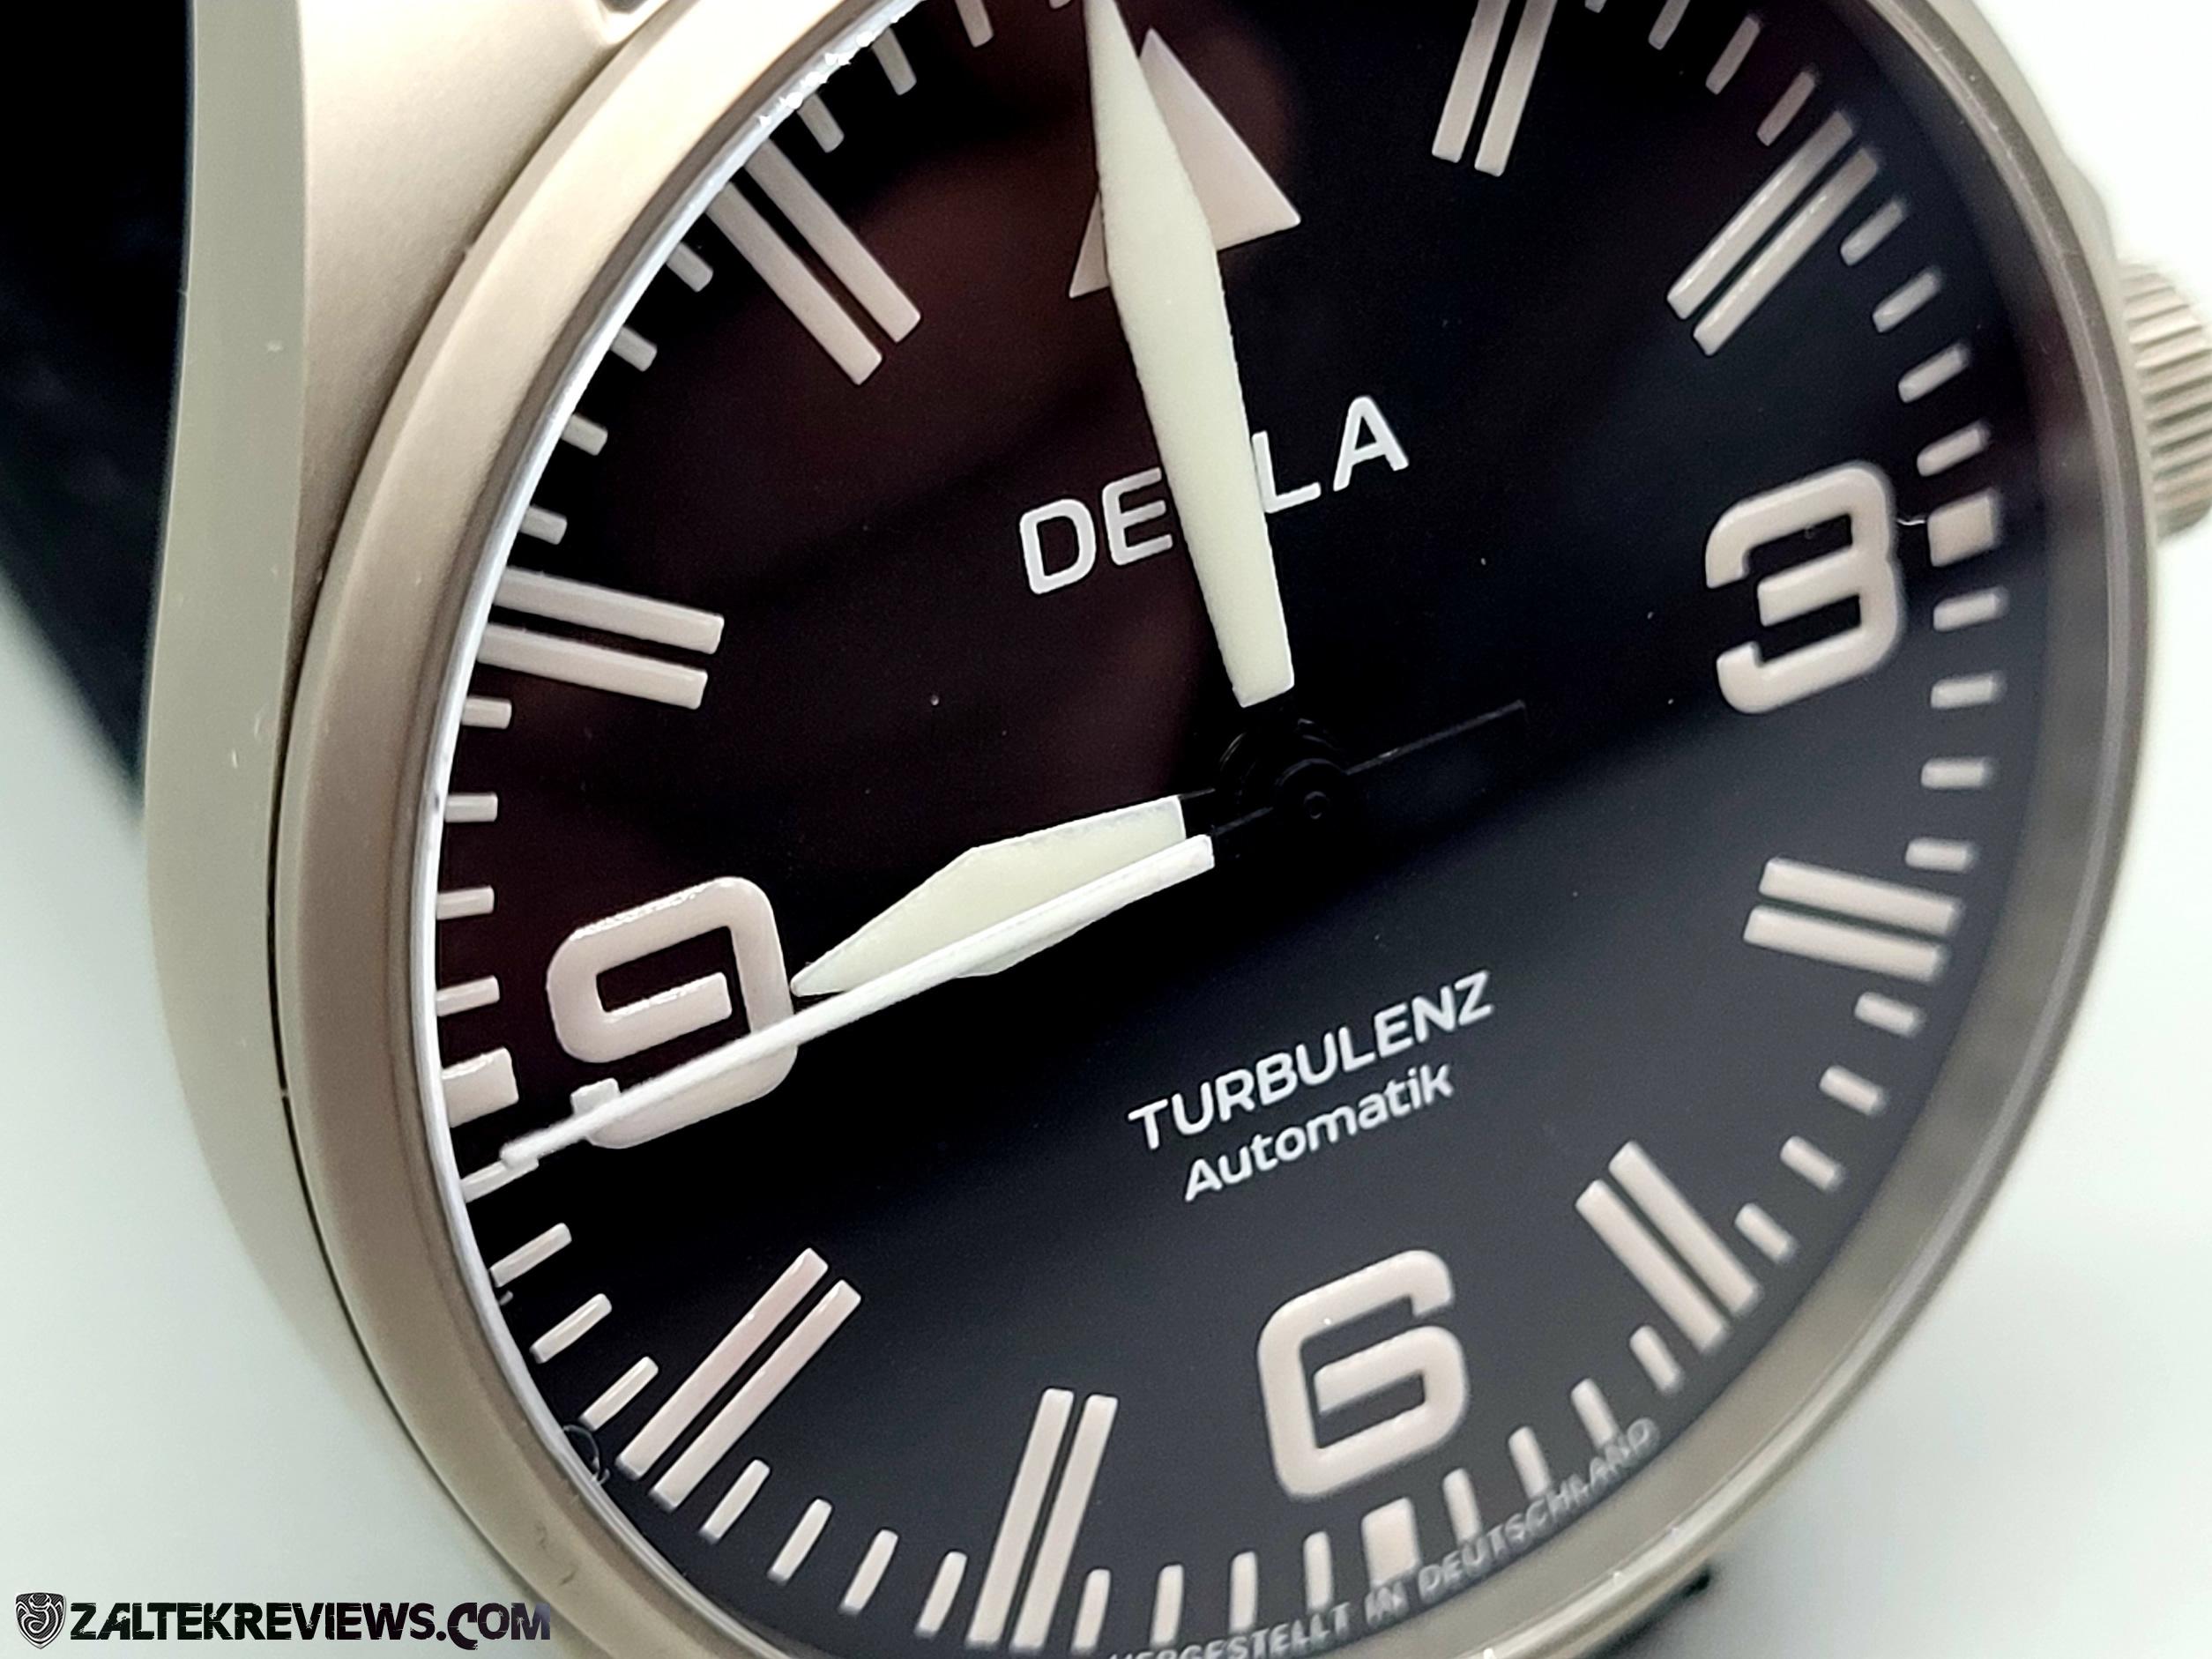 DEKLA Turbulenz 40mm v.2 Review